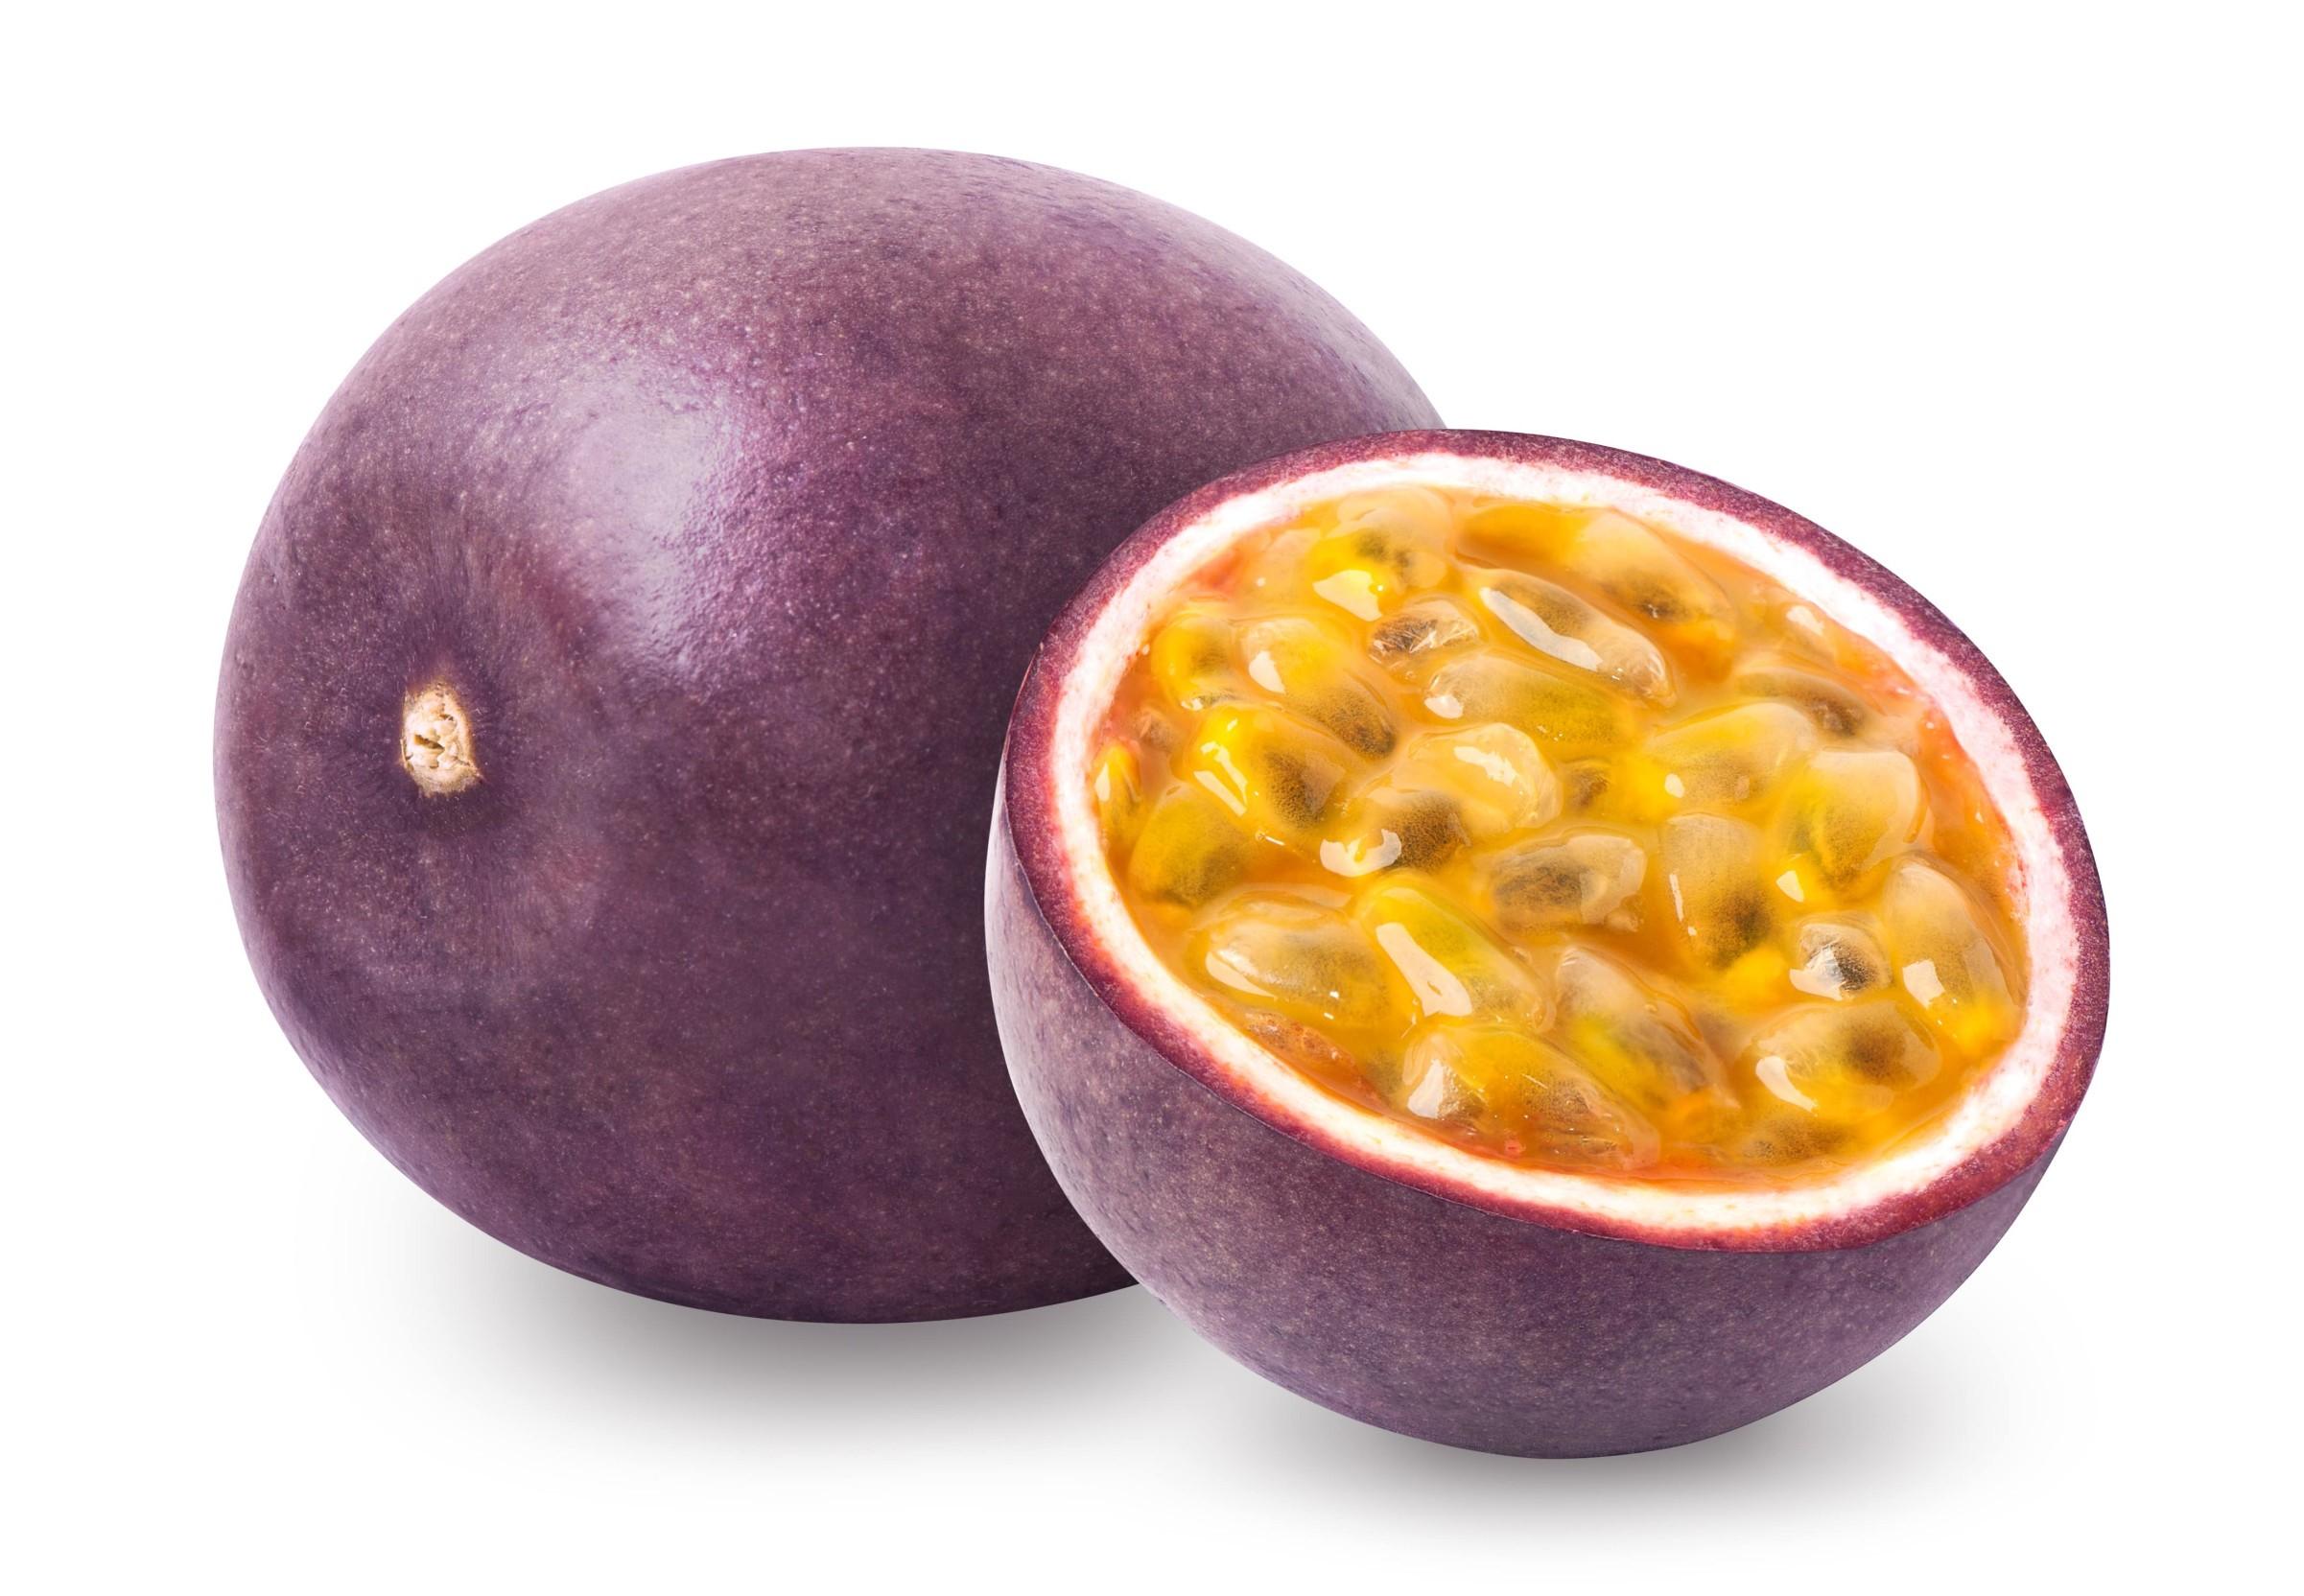 Спелый плод маракуйя фото в разрезе